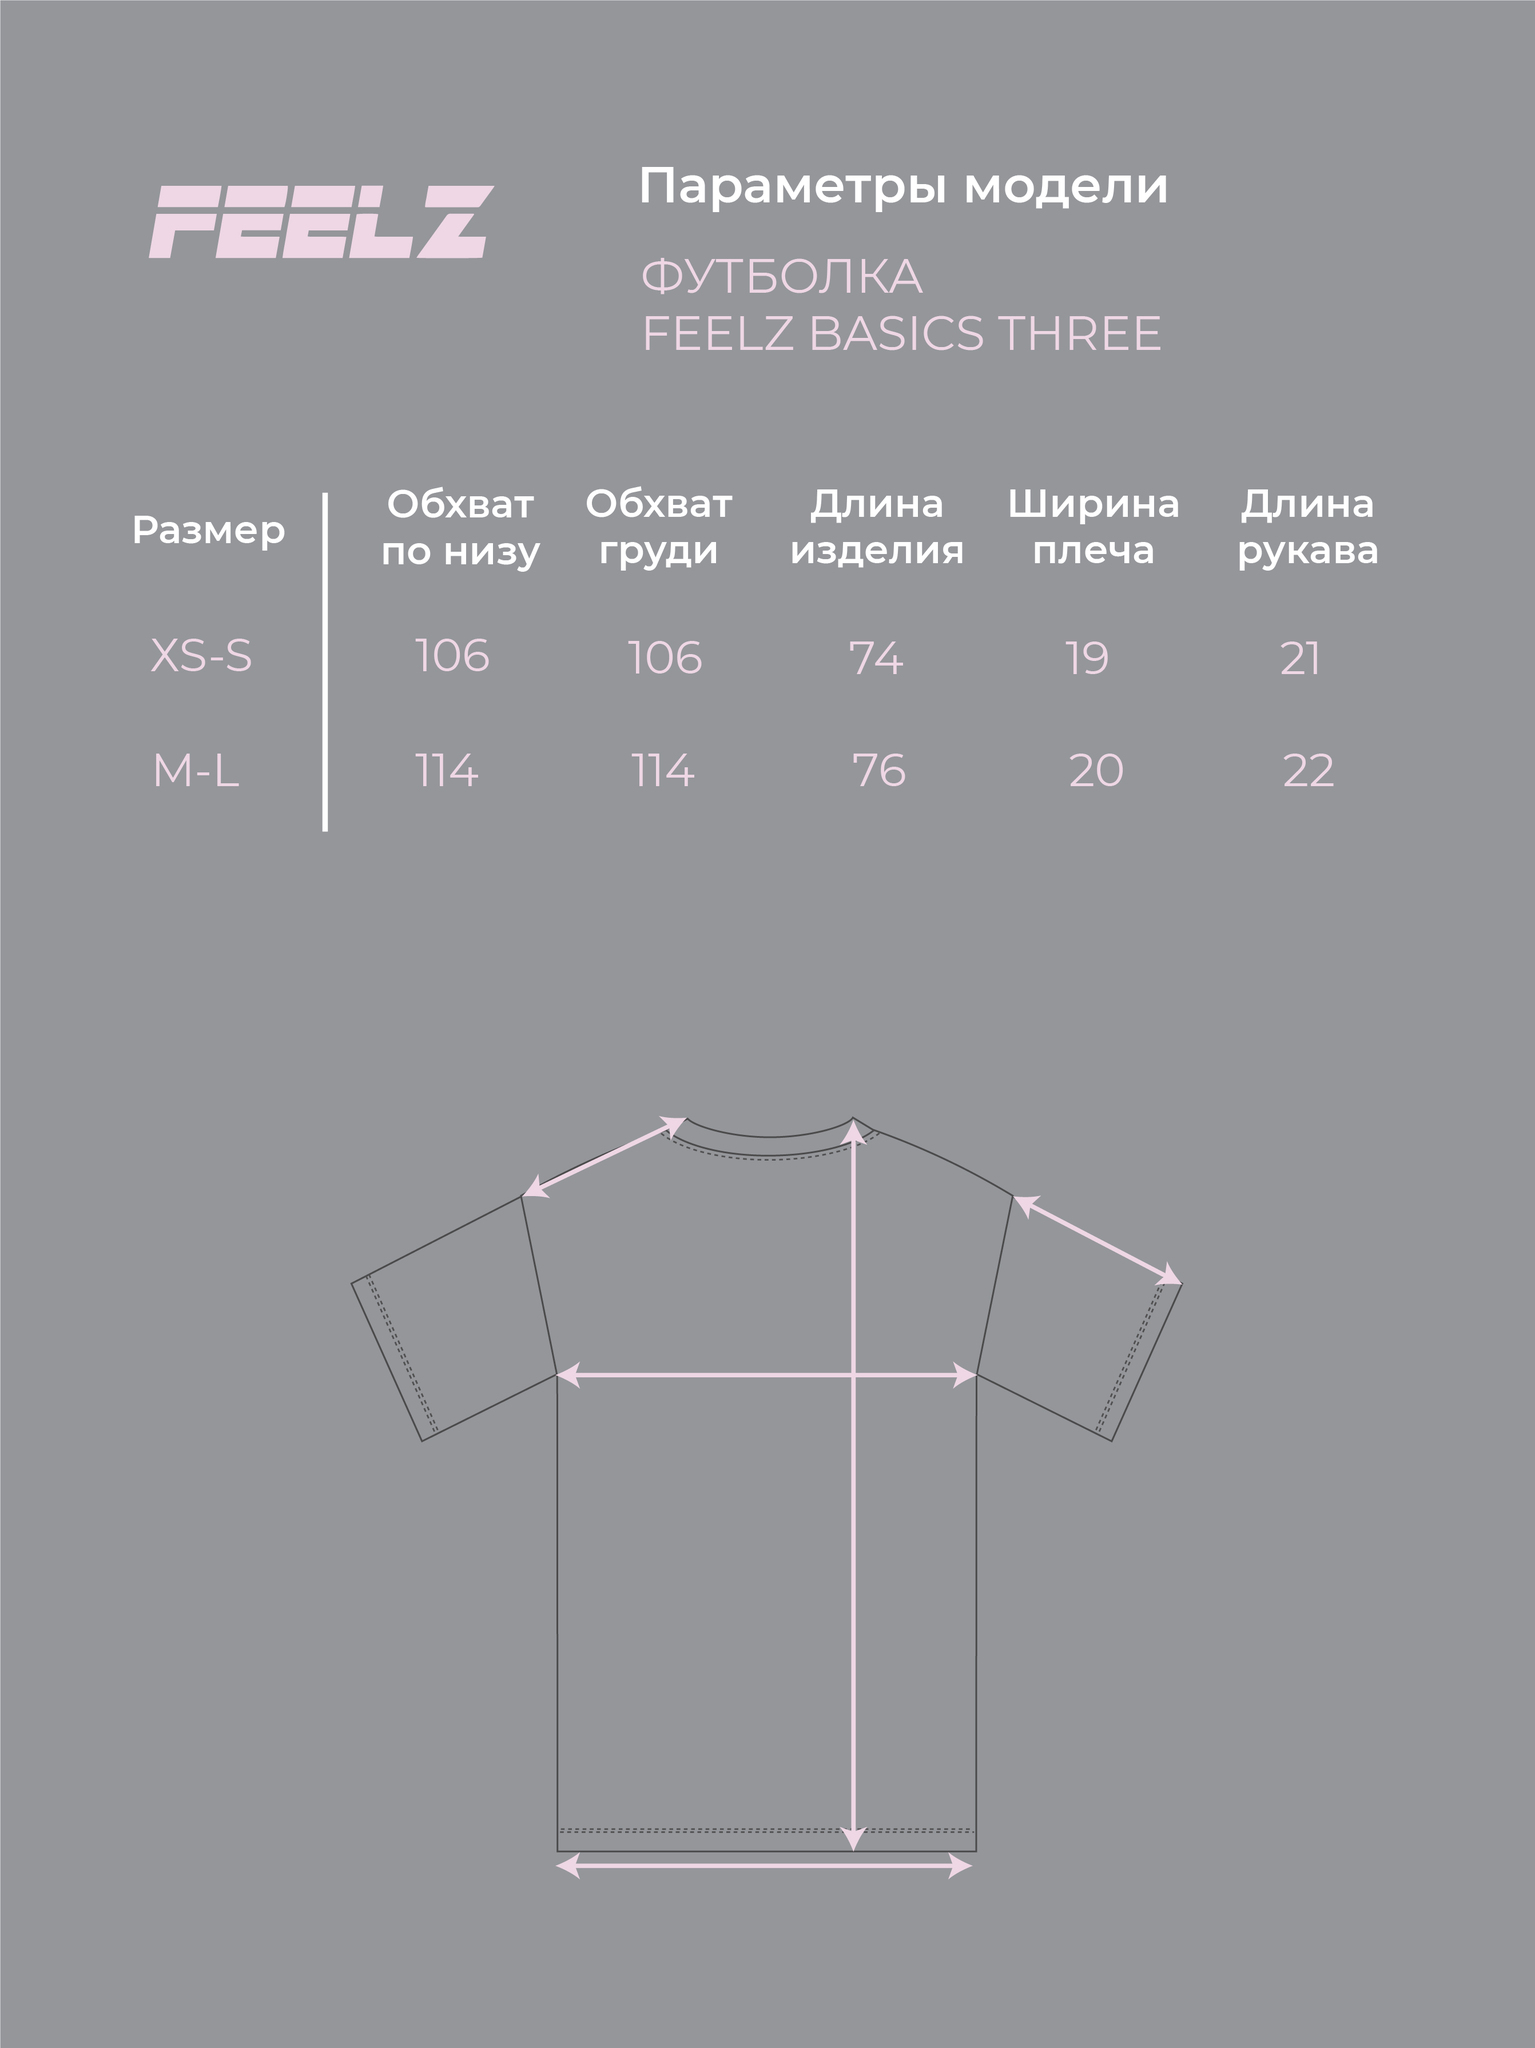 Футболка Feelz Basics Three, Персиковый